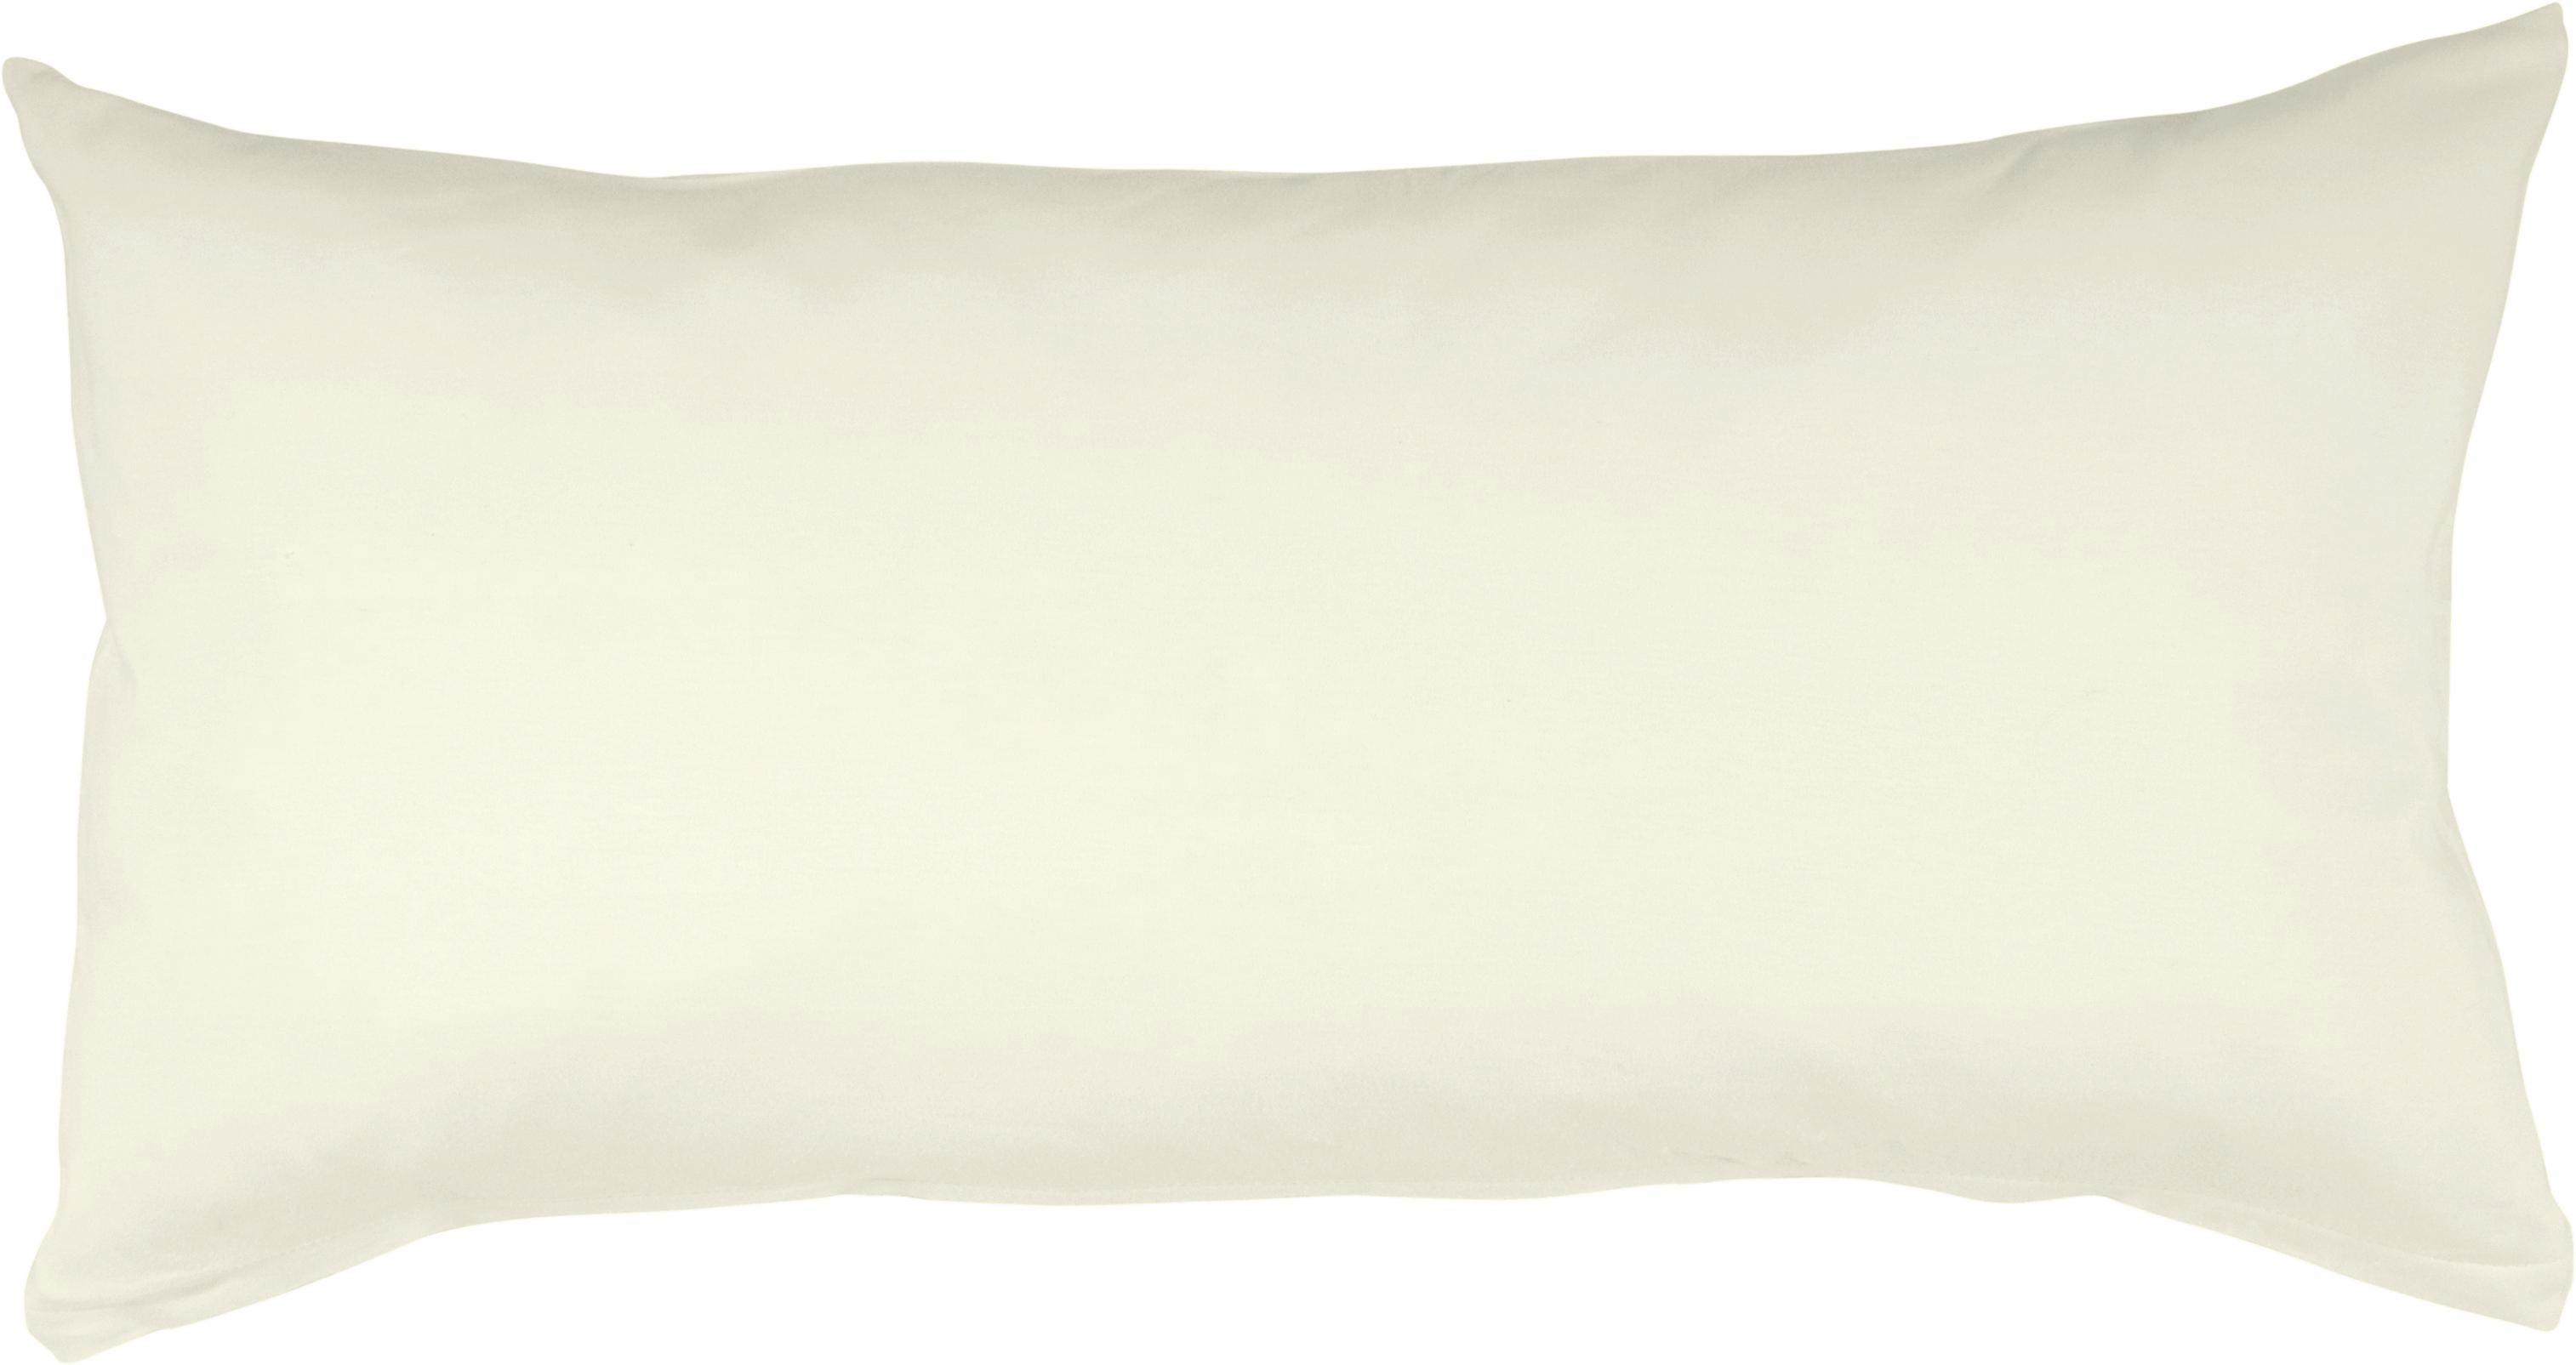 KISSENHÜLLE Beige 40/80 cm - Beige, Basics, Textil (40/80cm) - SCHLAFGUT